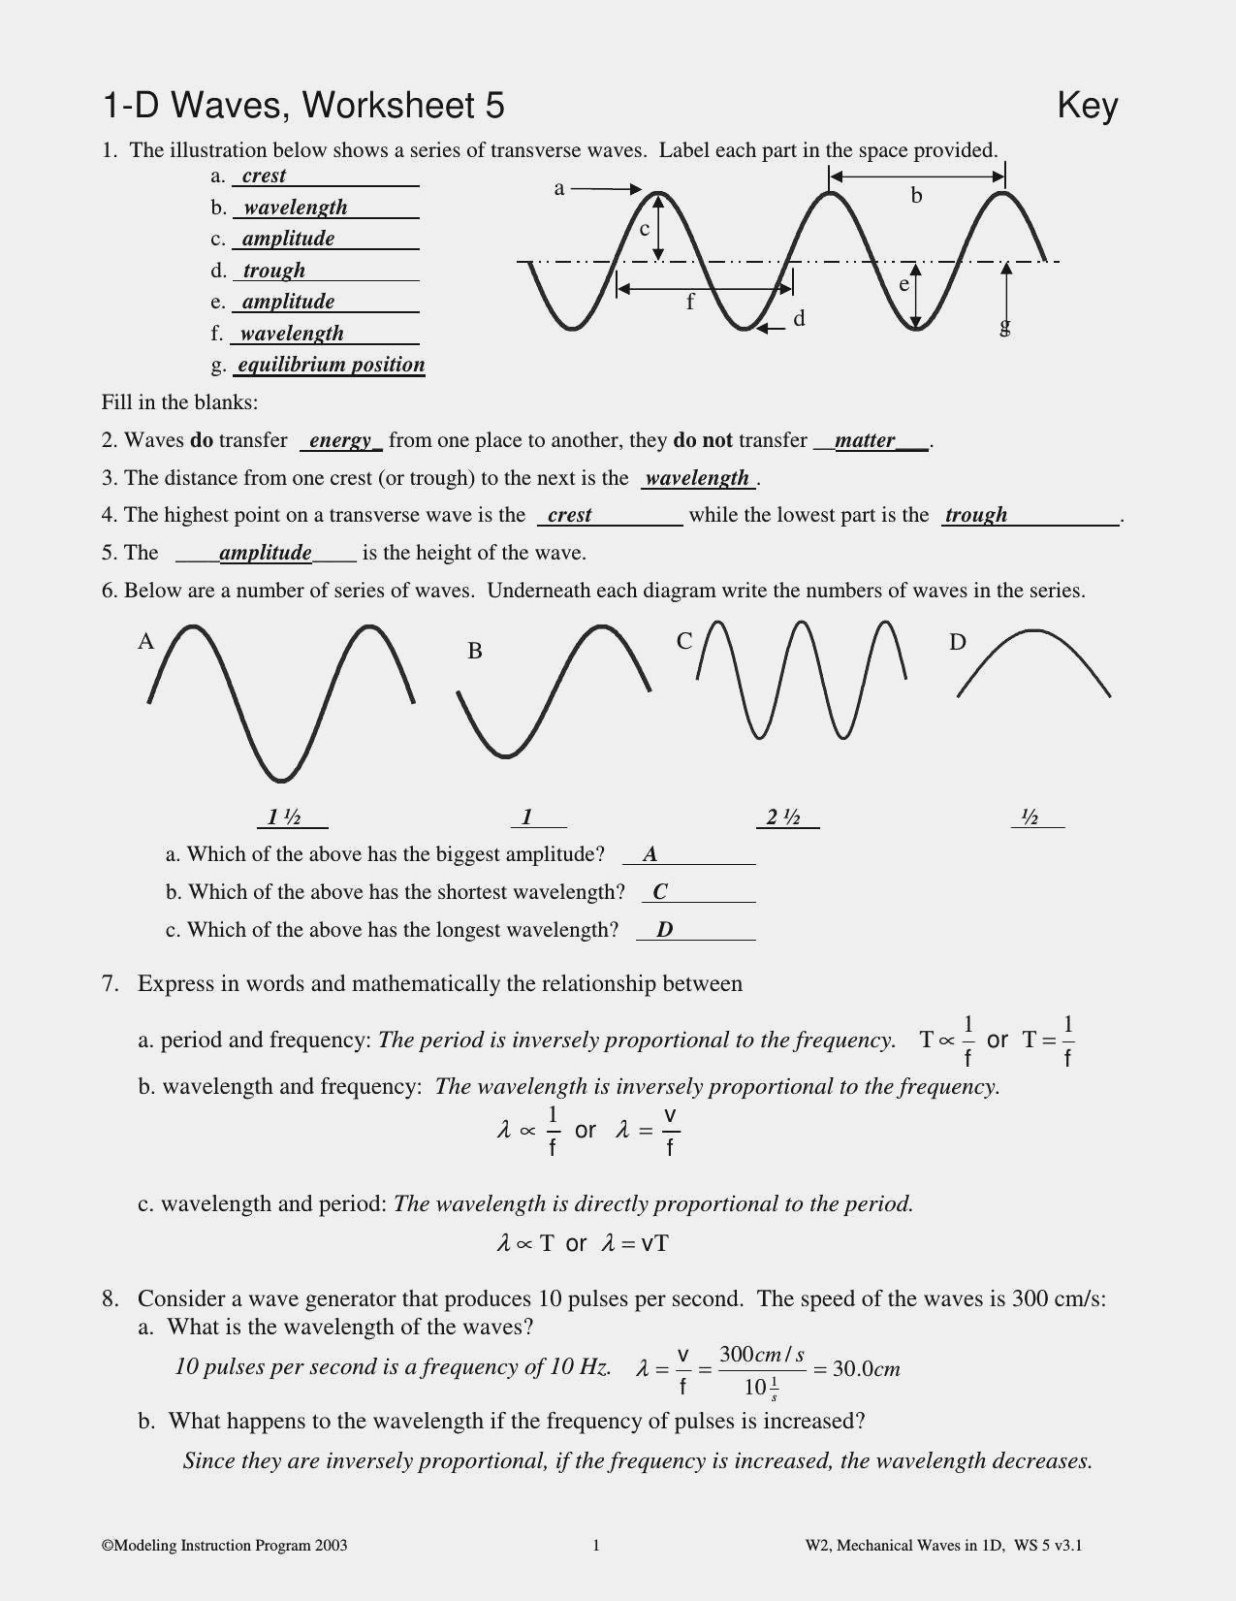 Worksheet Labeling Waves Answer Key Or Electromagnetic Spectrum With Regard To Worksheet Labeling Waves Answer Key